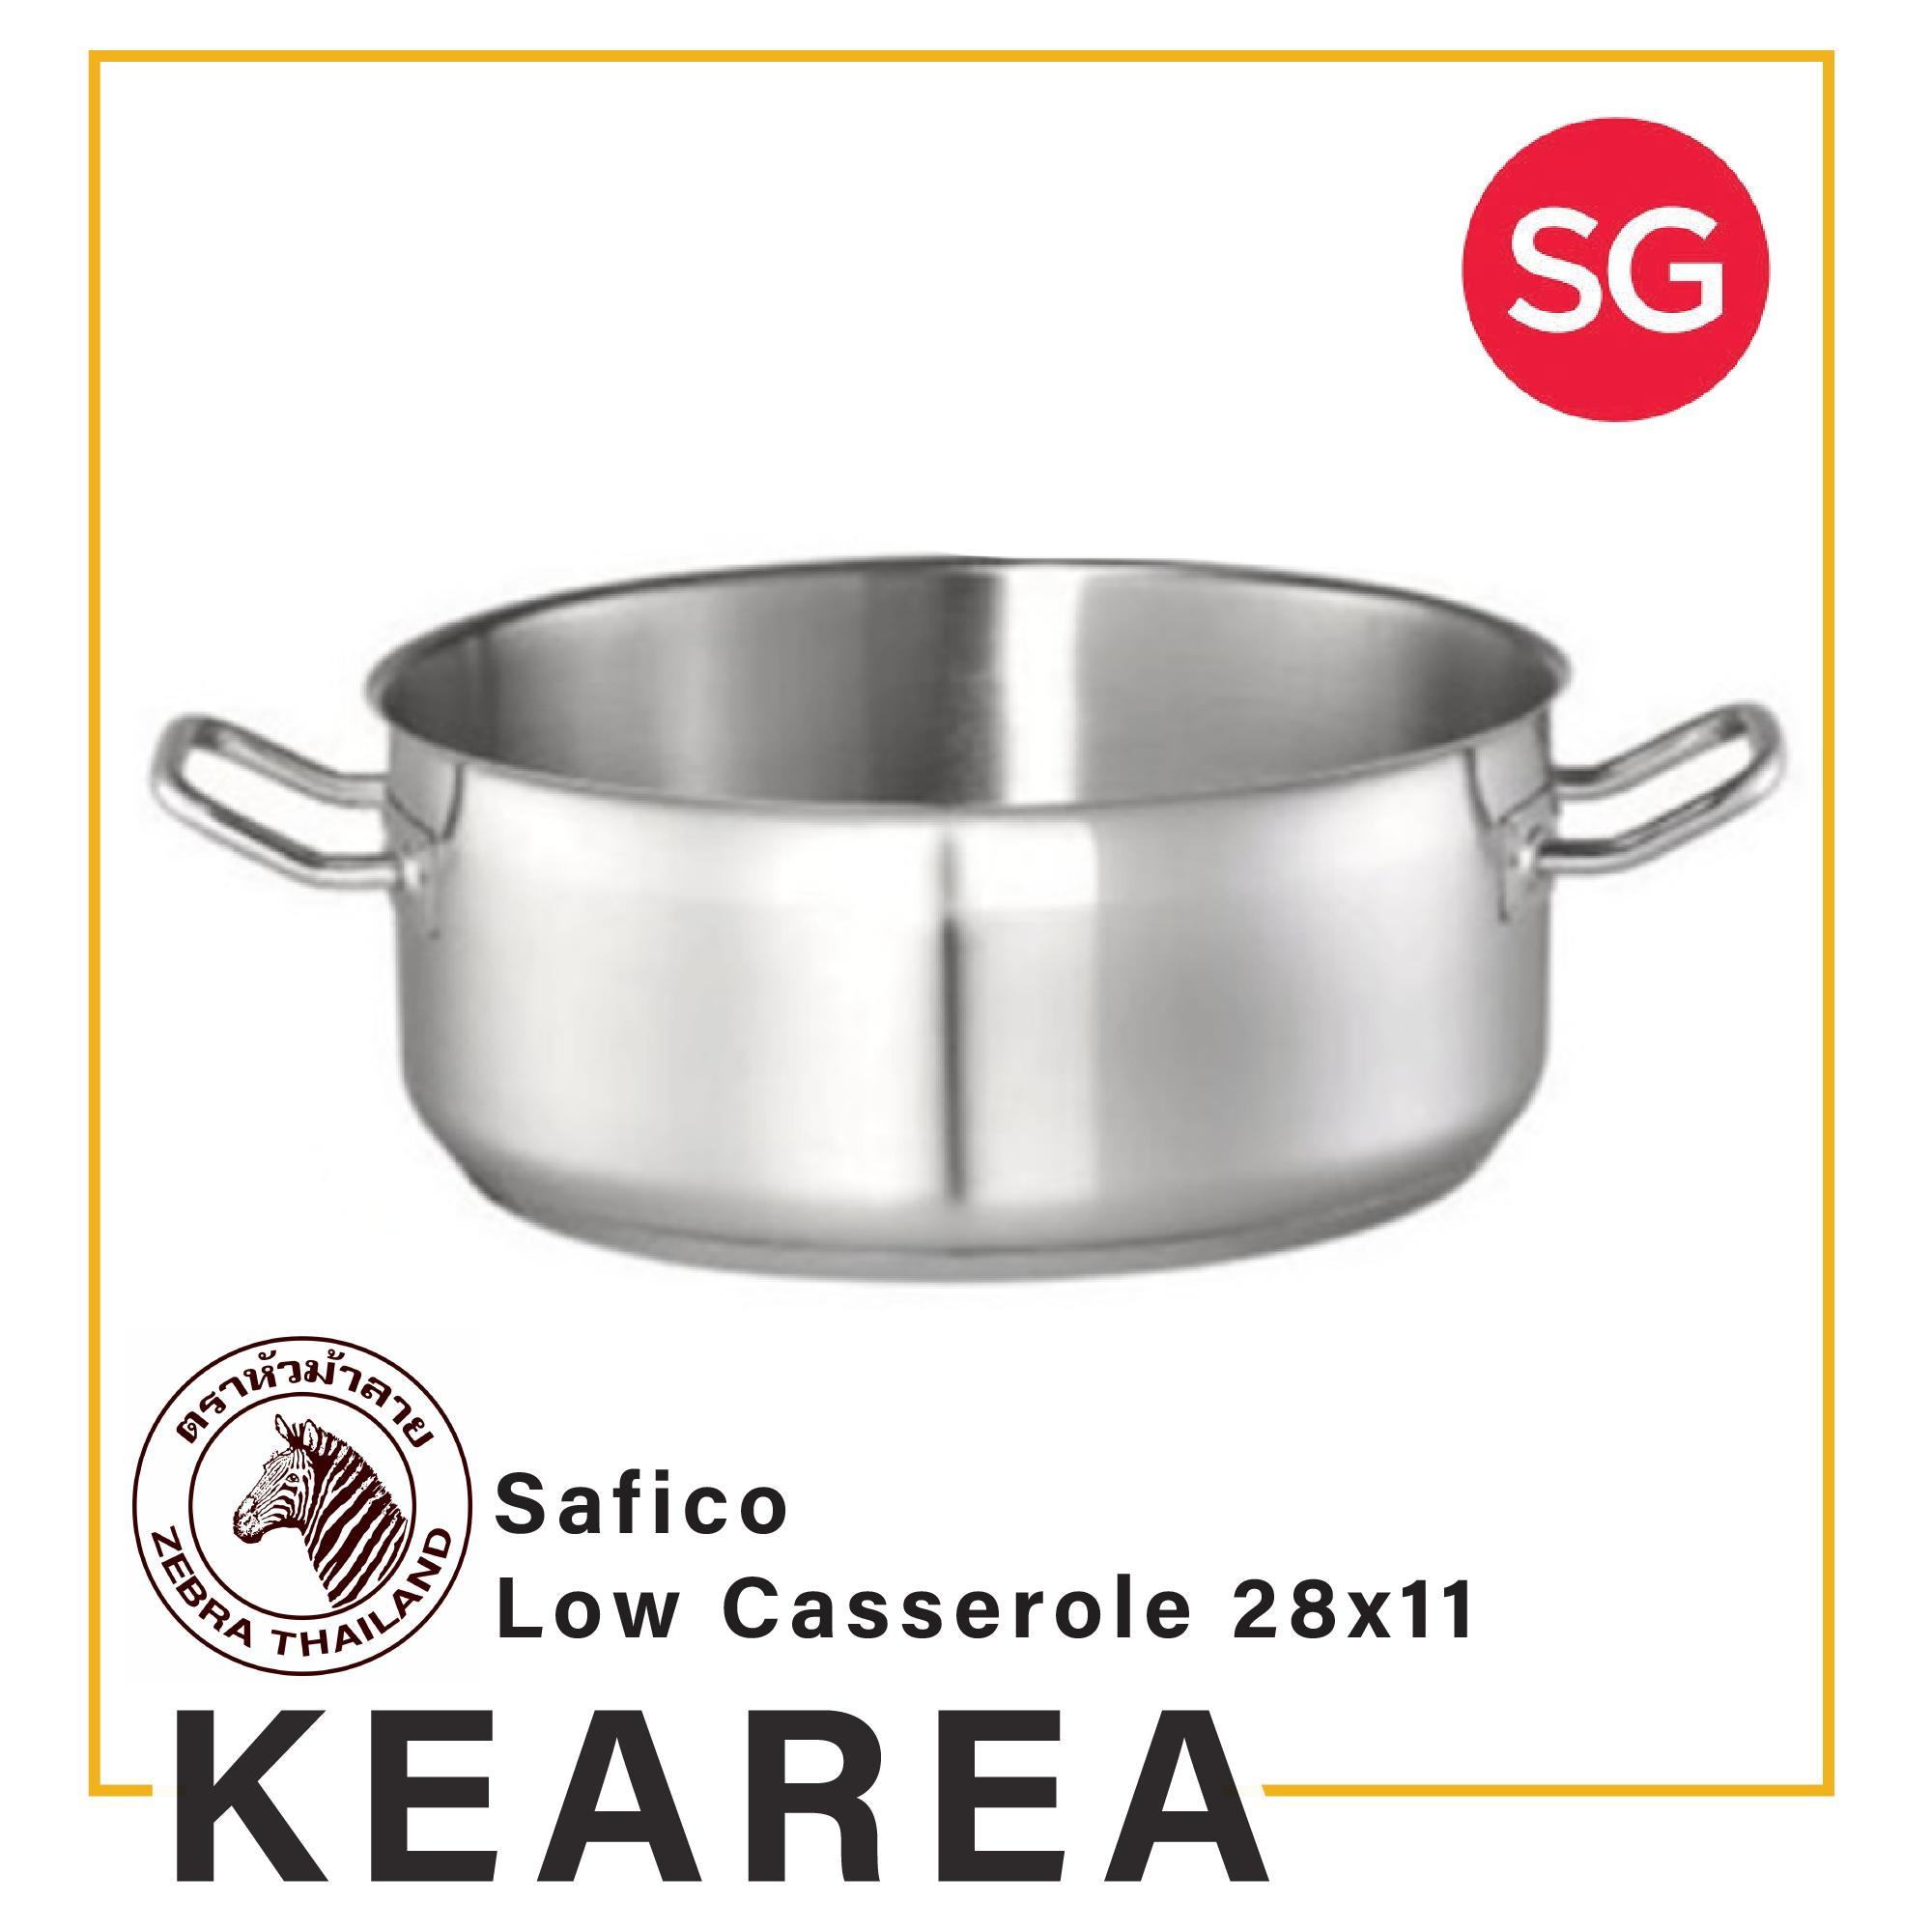 cd791fa1 Casserole Pots - Buy Casserole Pots at Best Price in Singapore ...